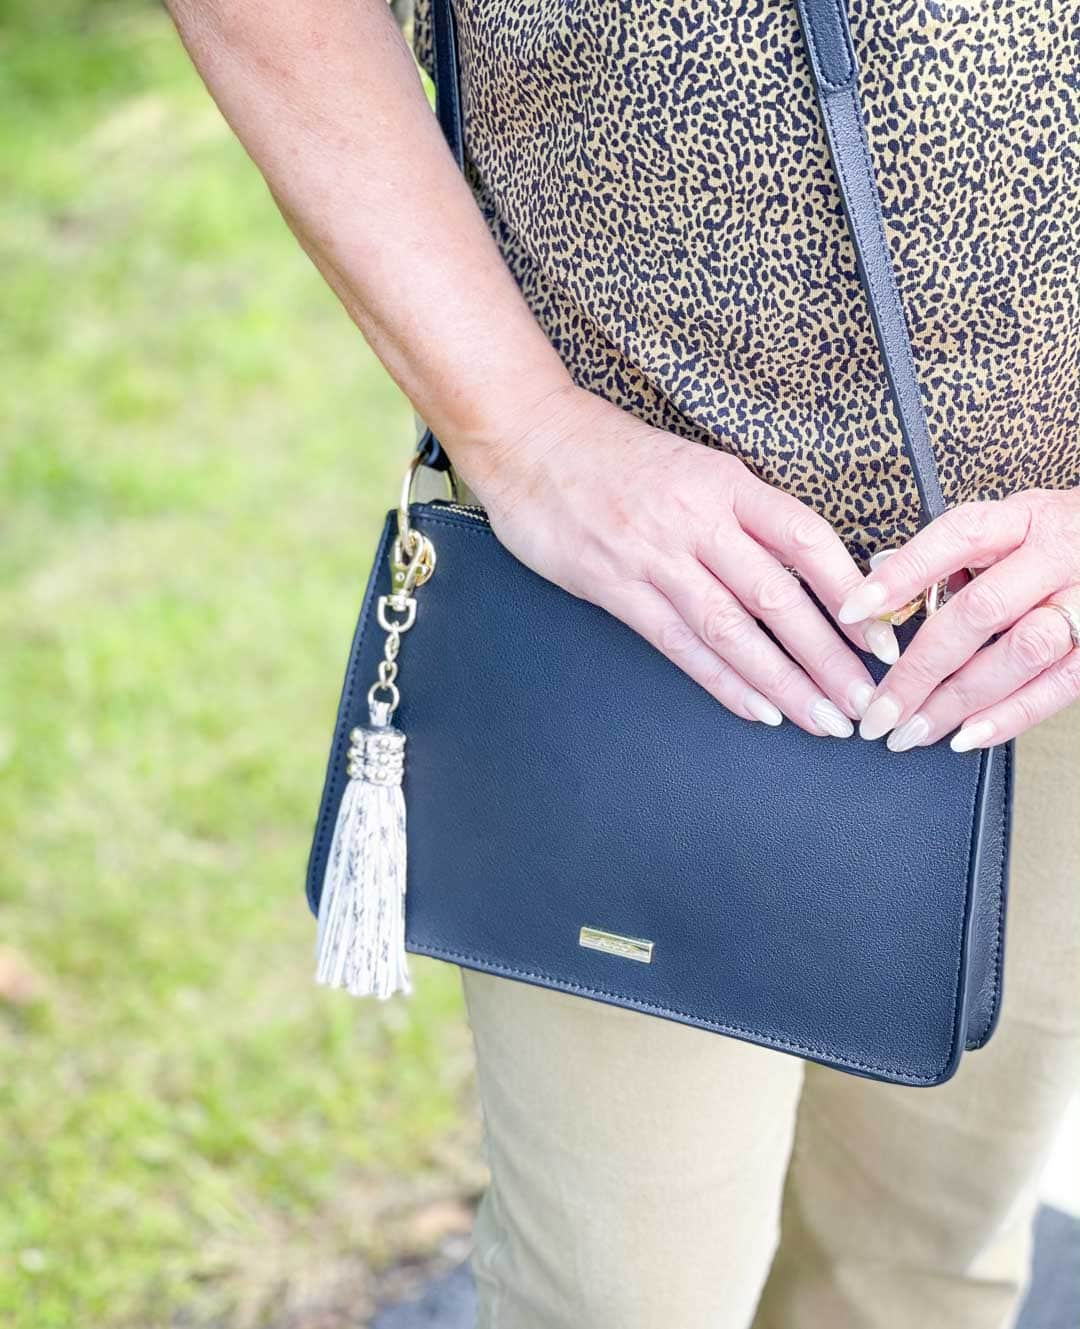 Over 40 Fashion Blogger, Tania Stephens is carrying a black handbag